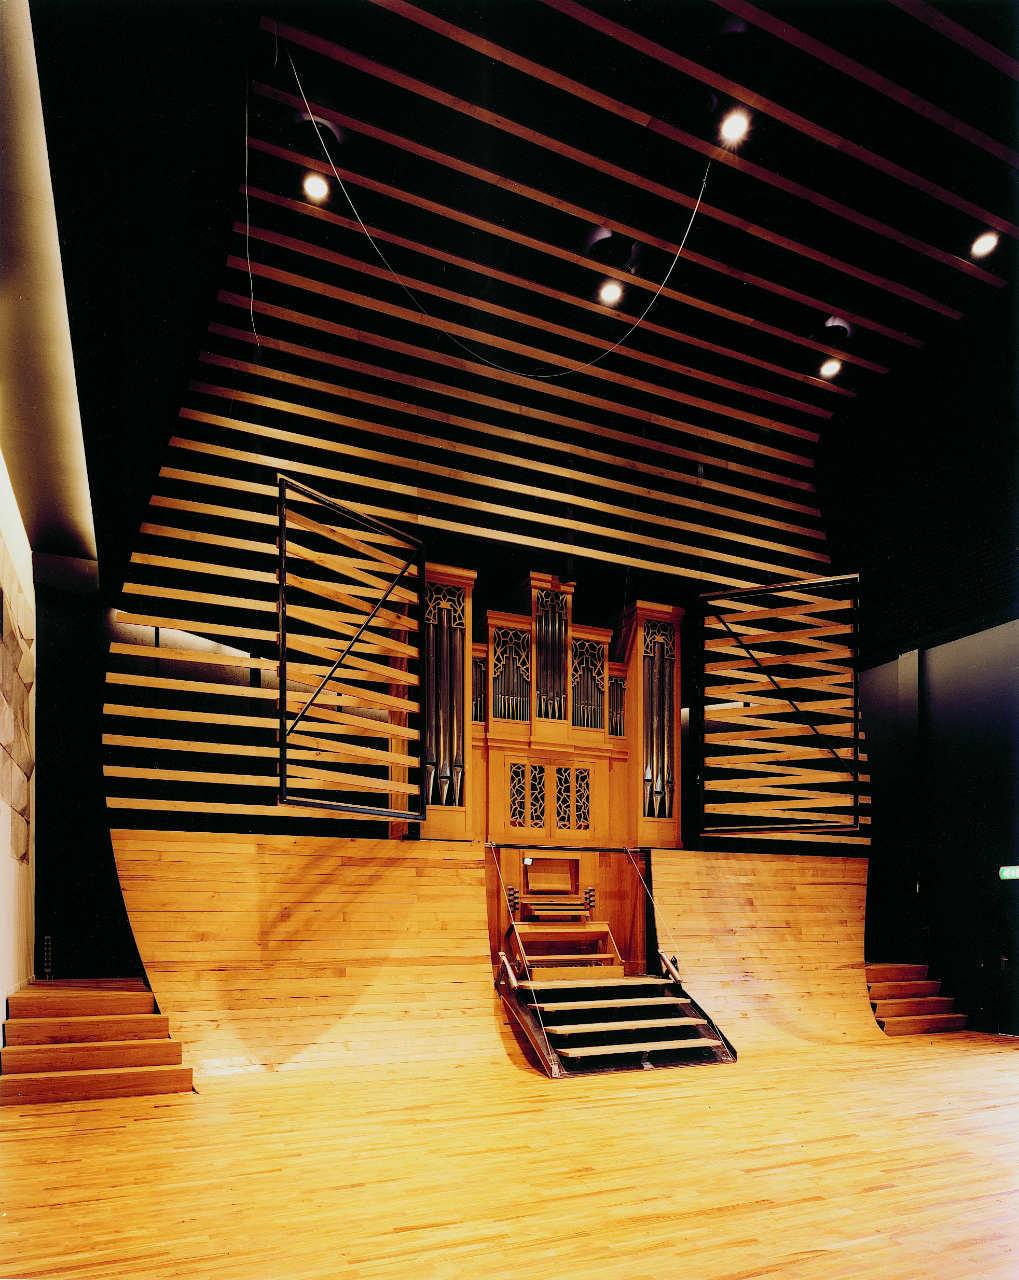 School of Music Auditorium / Onix, Courtesy of  onix